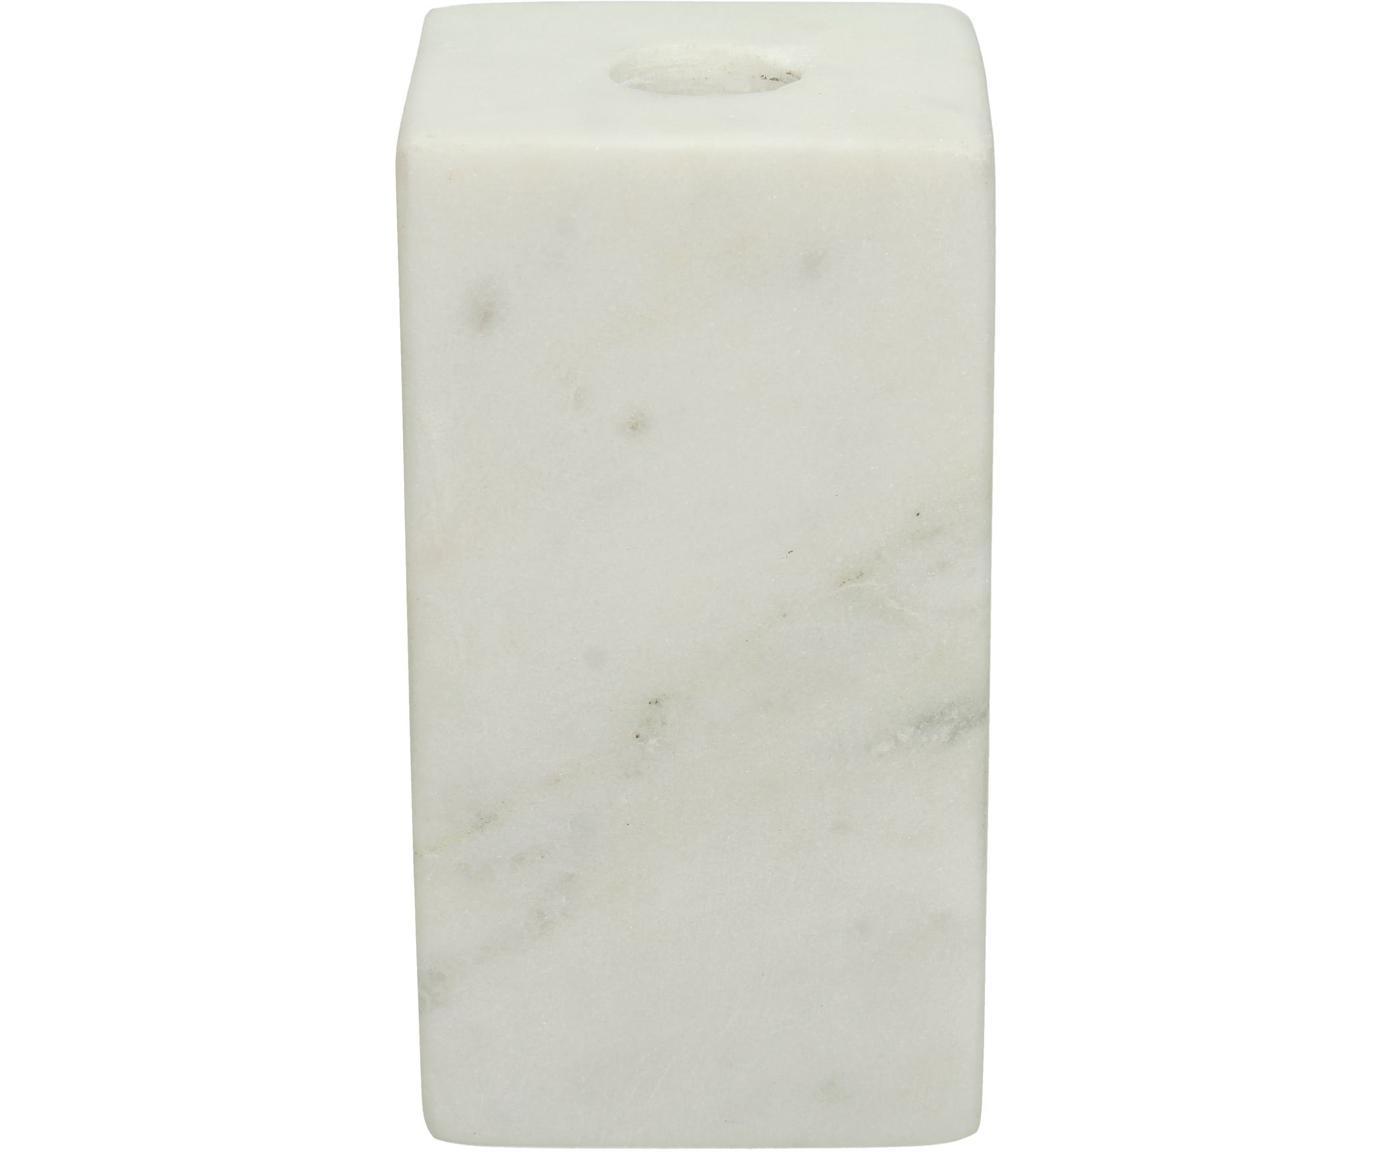 Marmor-Kerzenhalter Marble, Marmor, Weiß, 6 x 11 cm